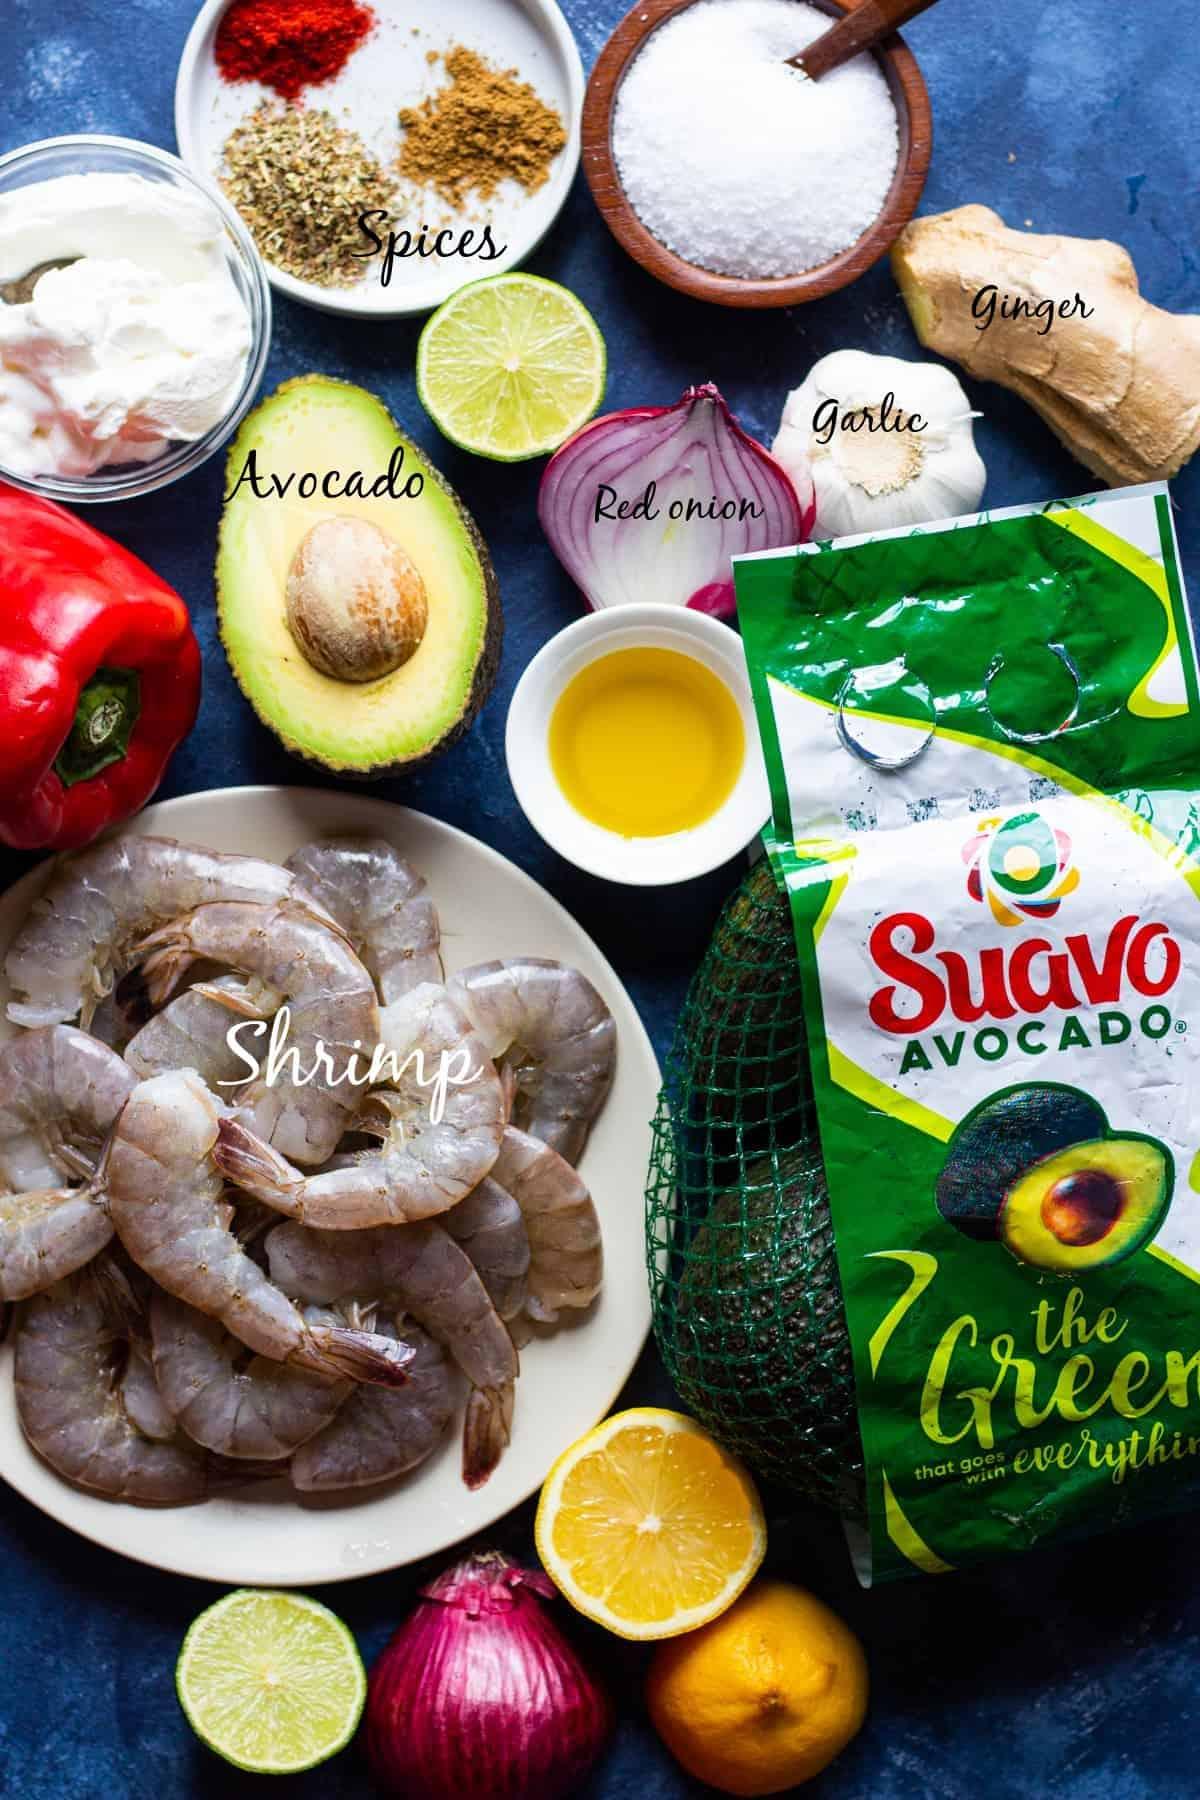 Ingredients are shrimp, spices, olive oil, avocado, yogurt, lemon, lime, ginger and garlic.